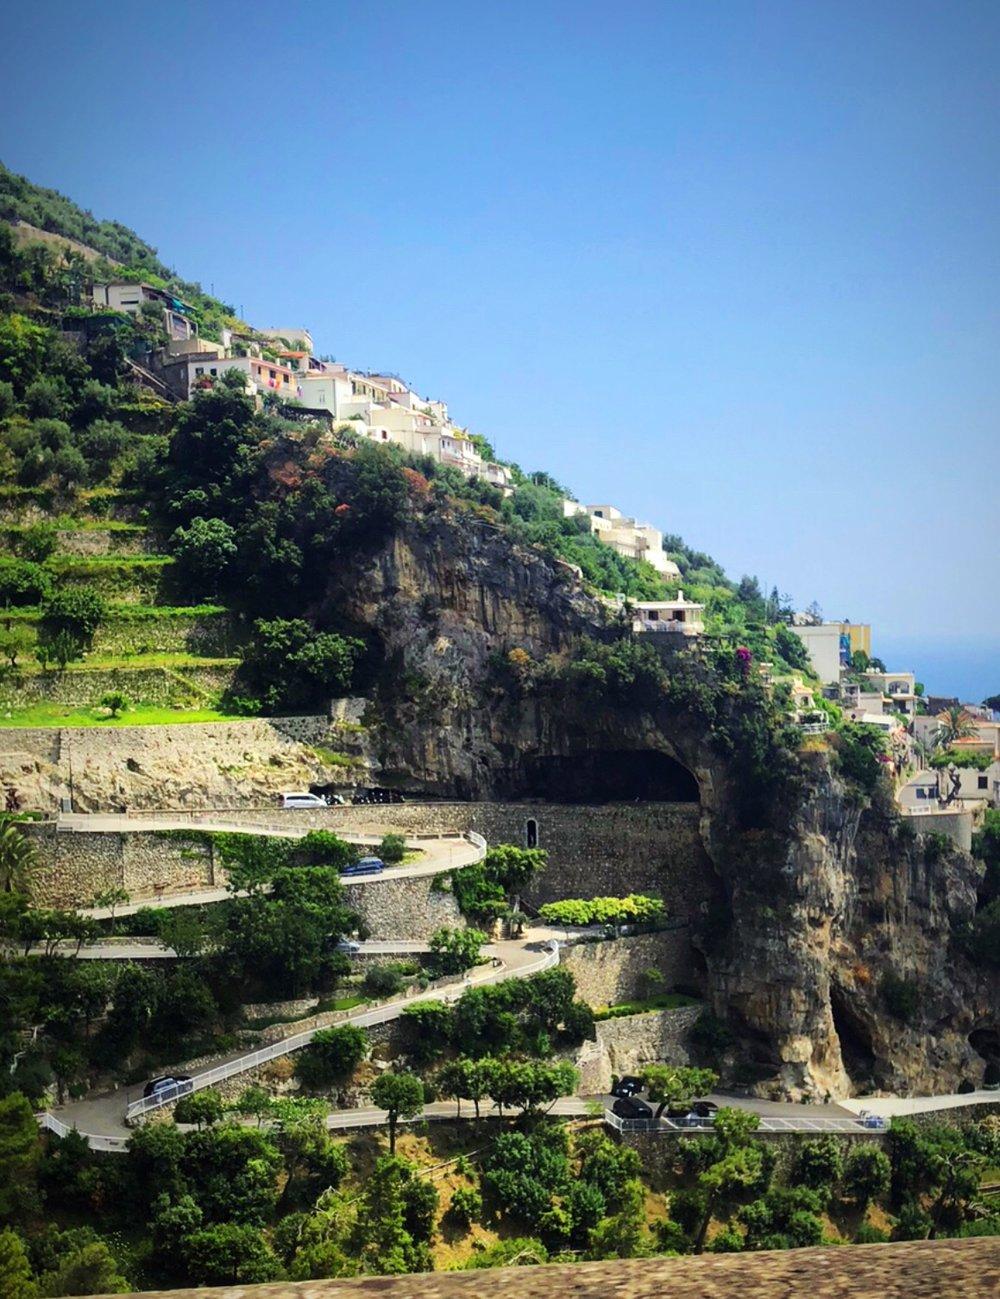 A typical road on the Amalfi Coast - minus traffic